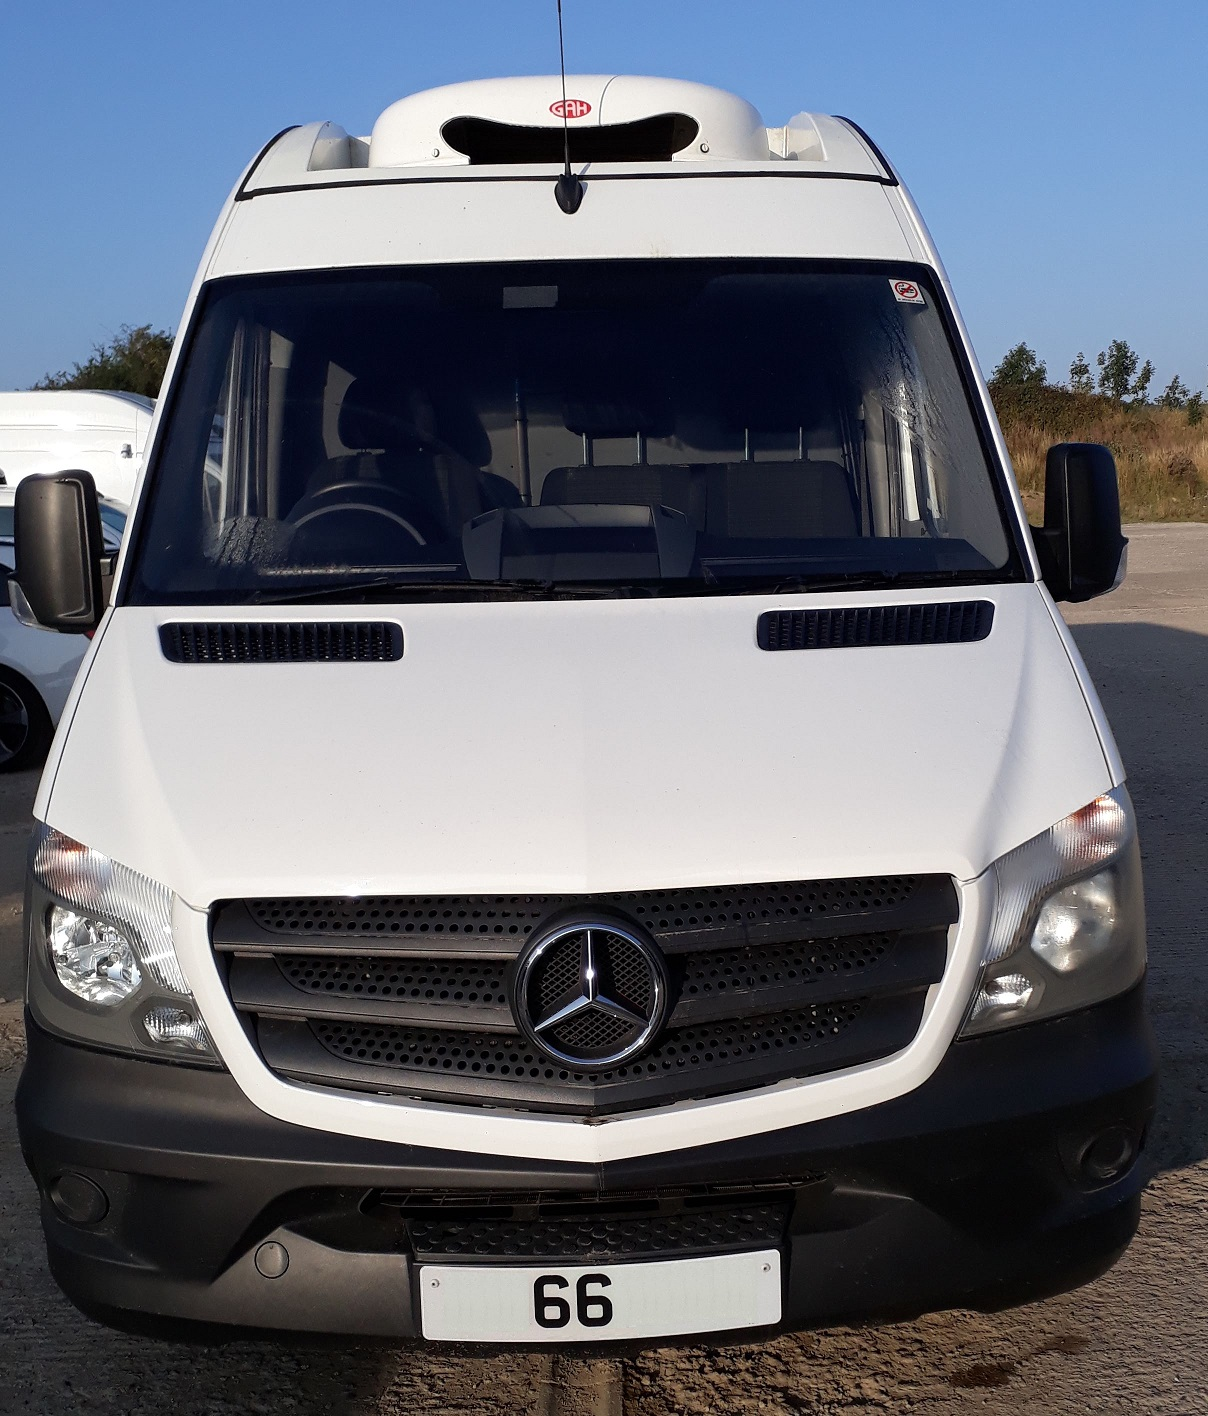 Mercedes sprinter LWB long chiller van for SALE FRONT also HIRE CONTRACT HIRE icicle fridge vans Tel 0345 5760 792